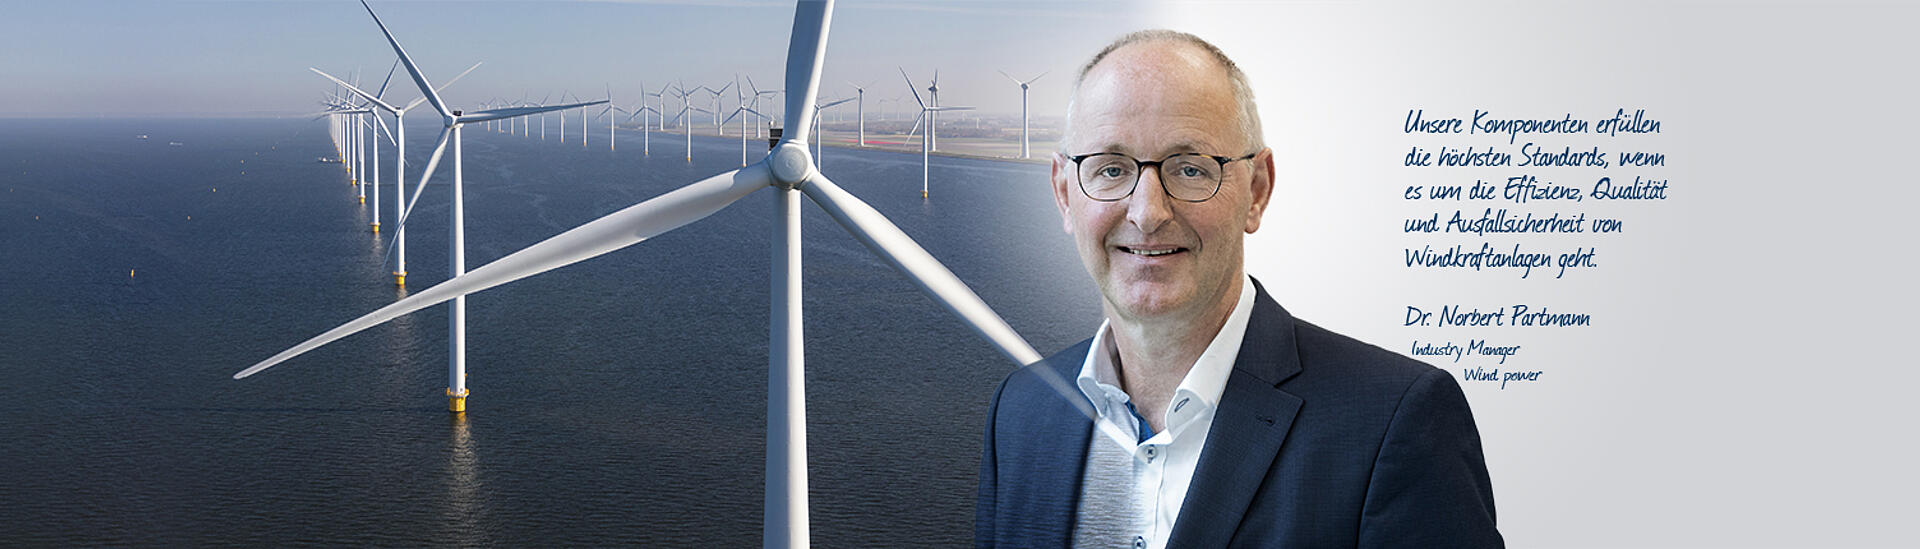 Branche Windkraft - KTR Systems GmbH